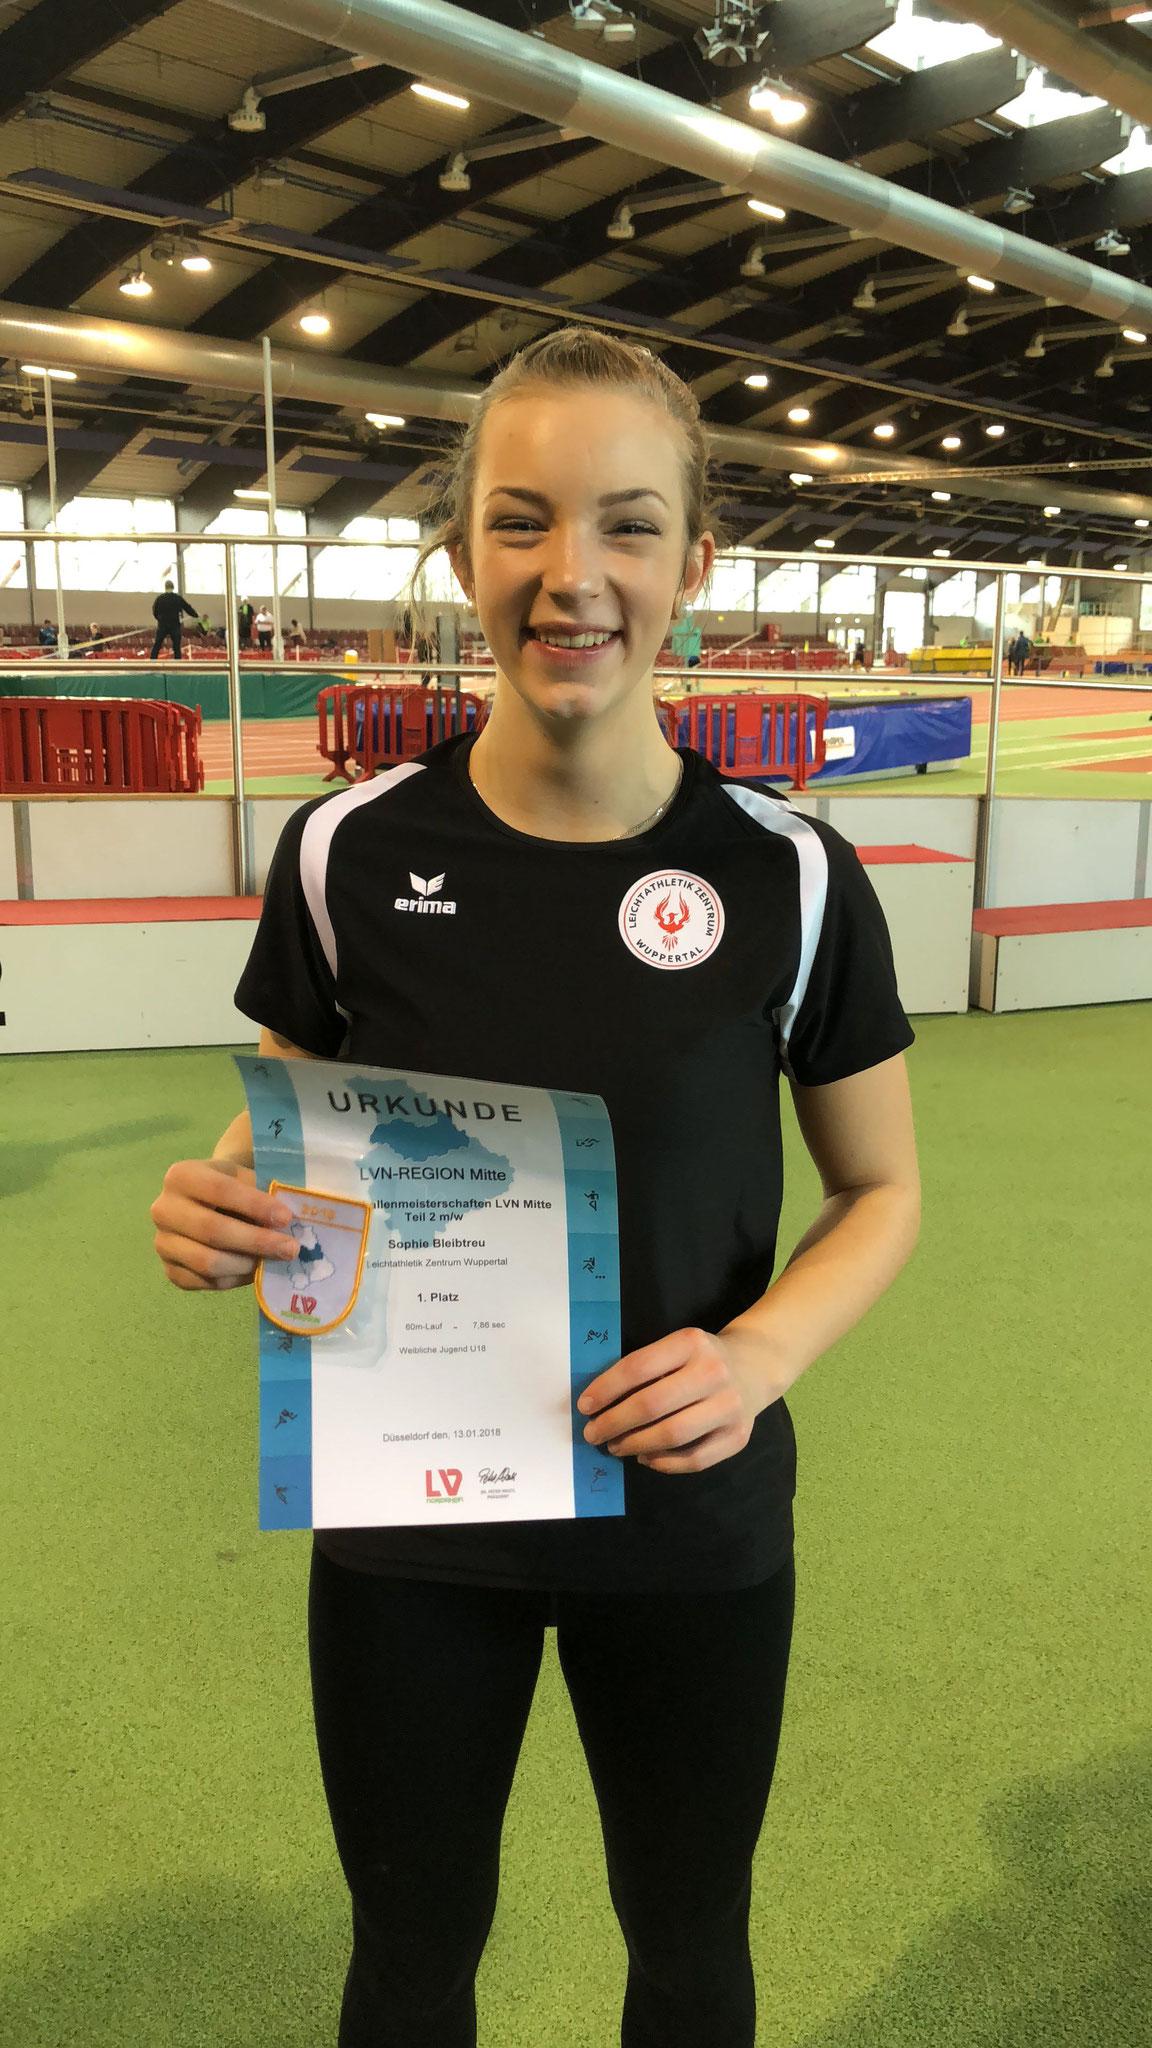 Siegerehrung 60m WJU18: 1. Sophie Bleibtreu